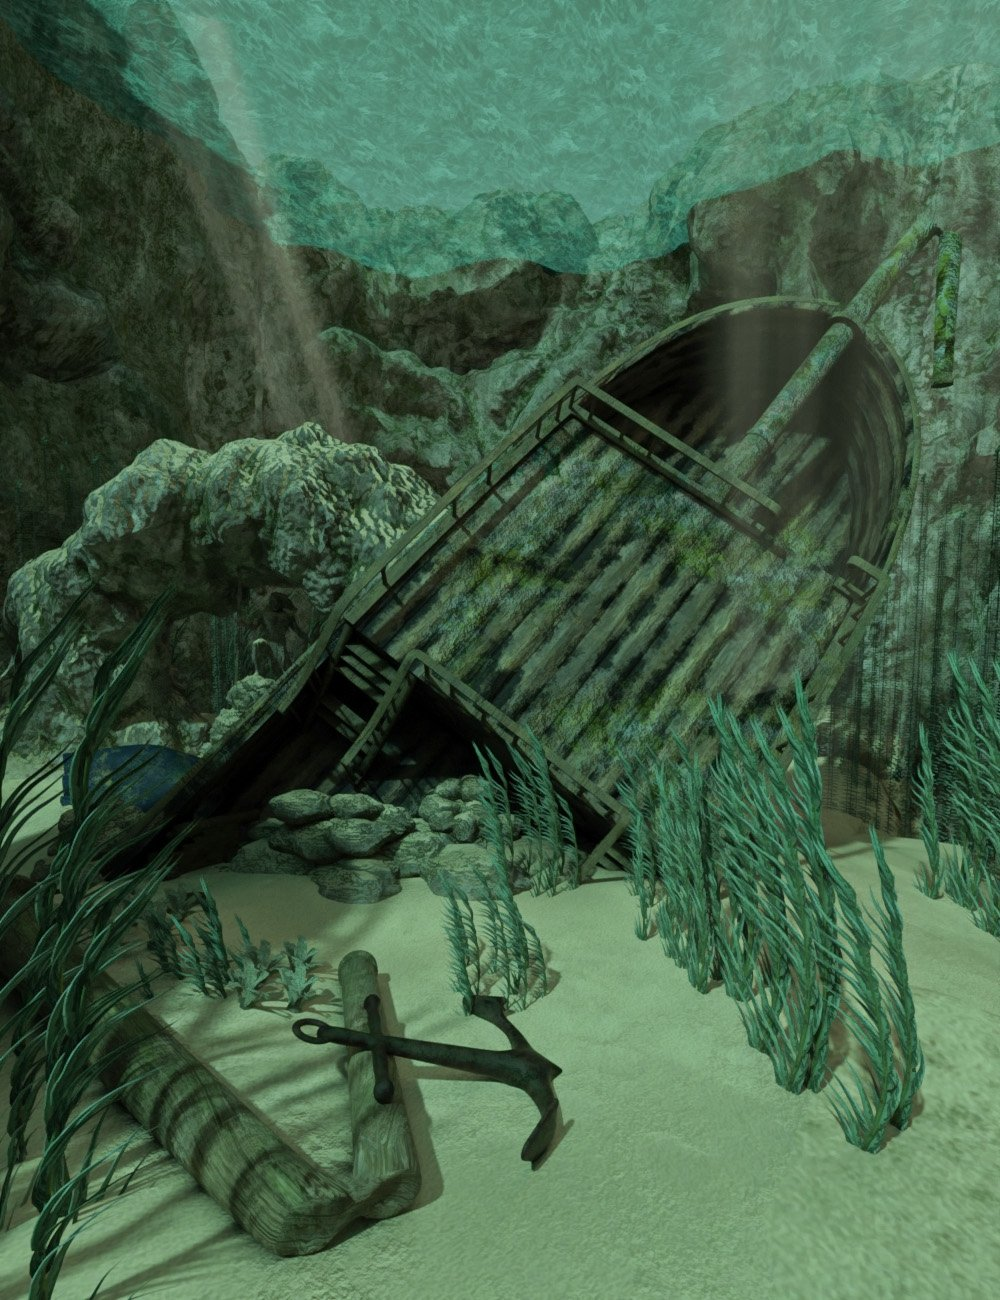 Aquatic Fantasy - Pirates Wreckage by: Sixus1 MediaSubSpeciesCreations, 3D Models by Daz 3D